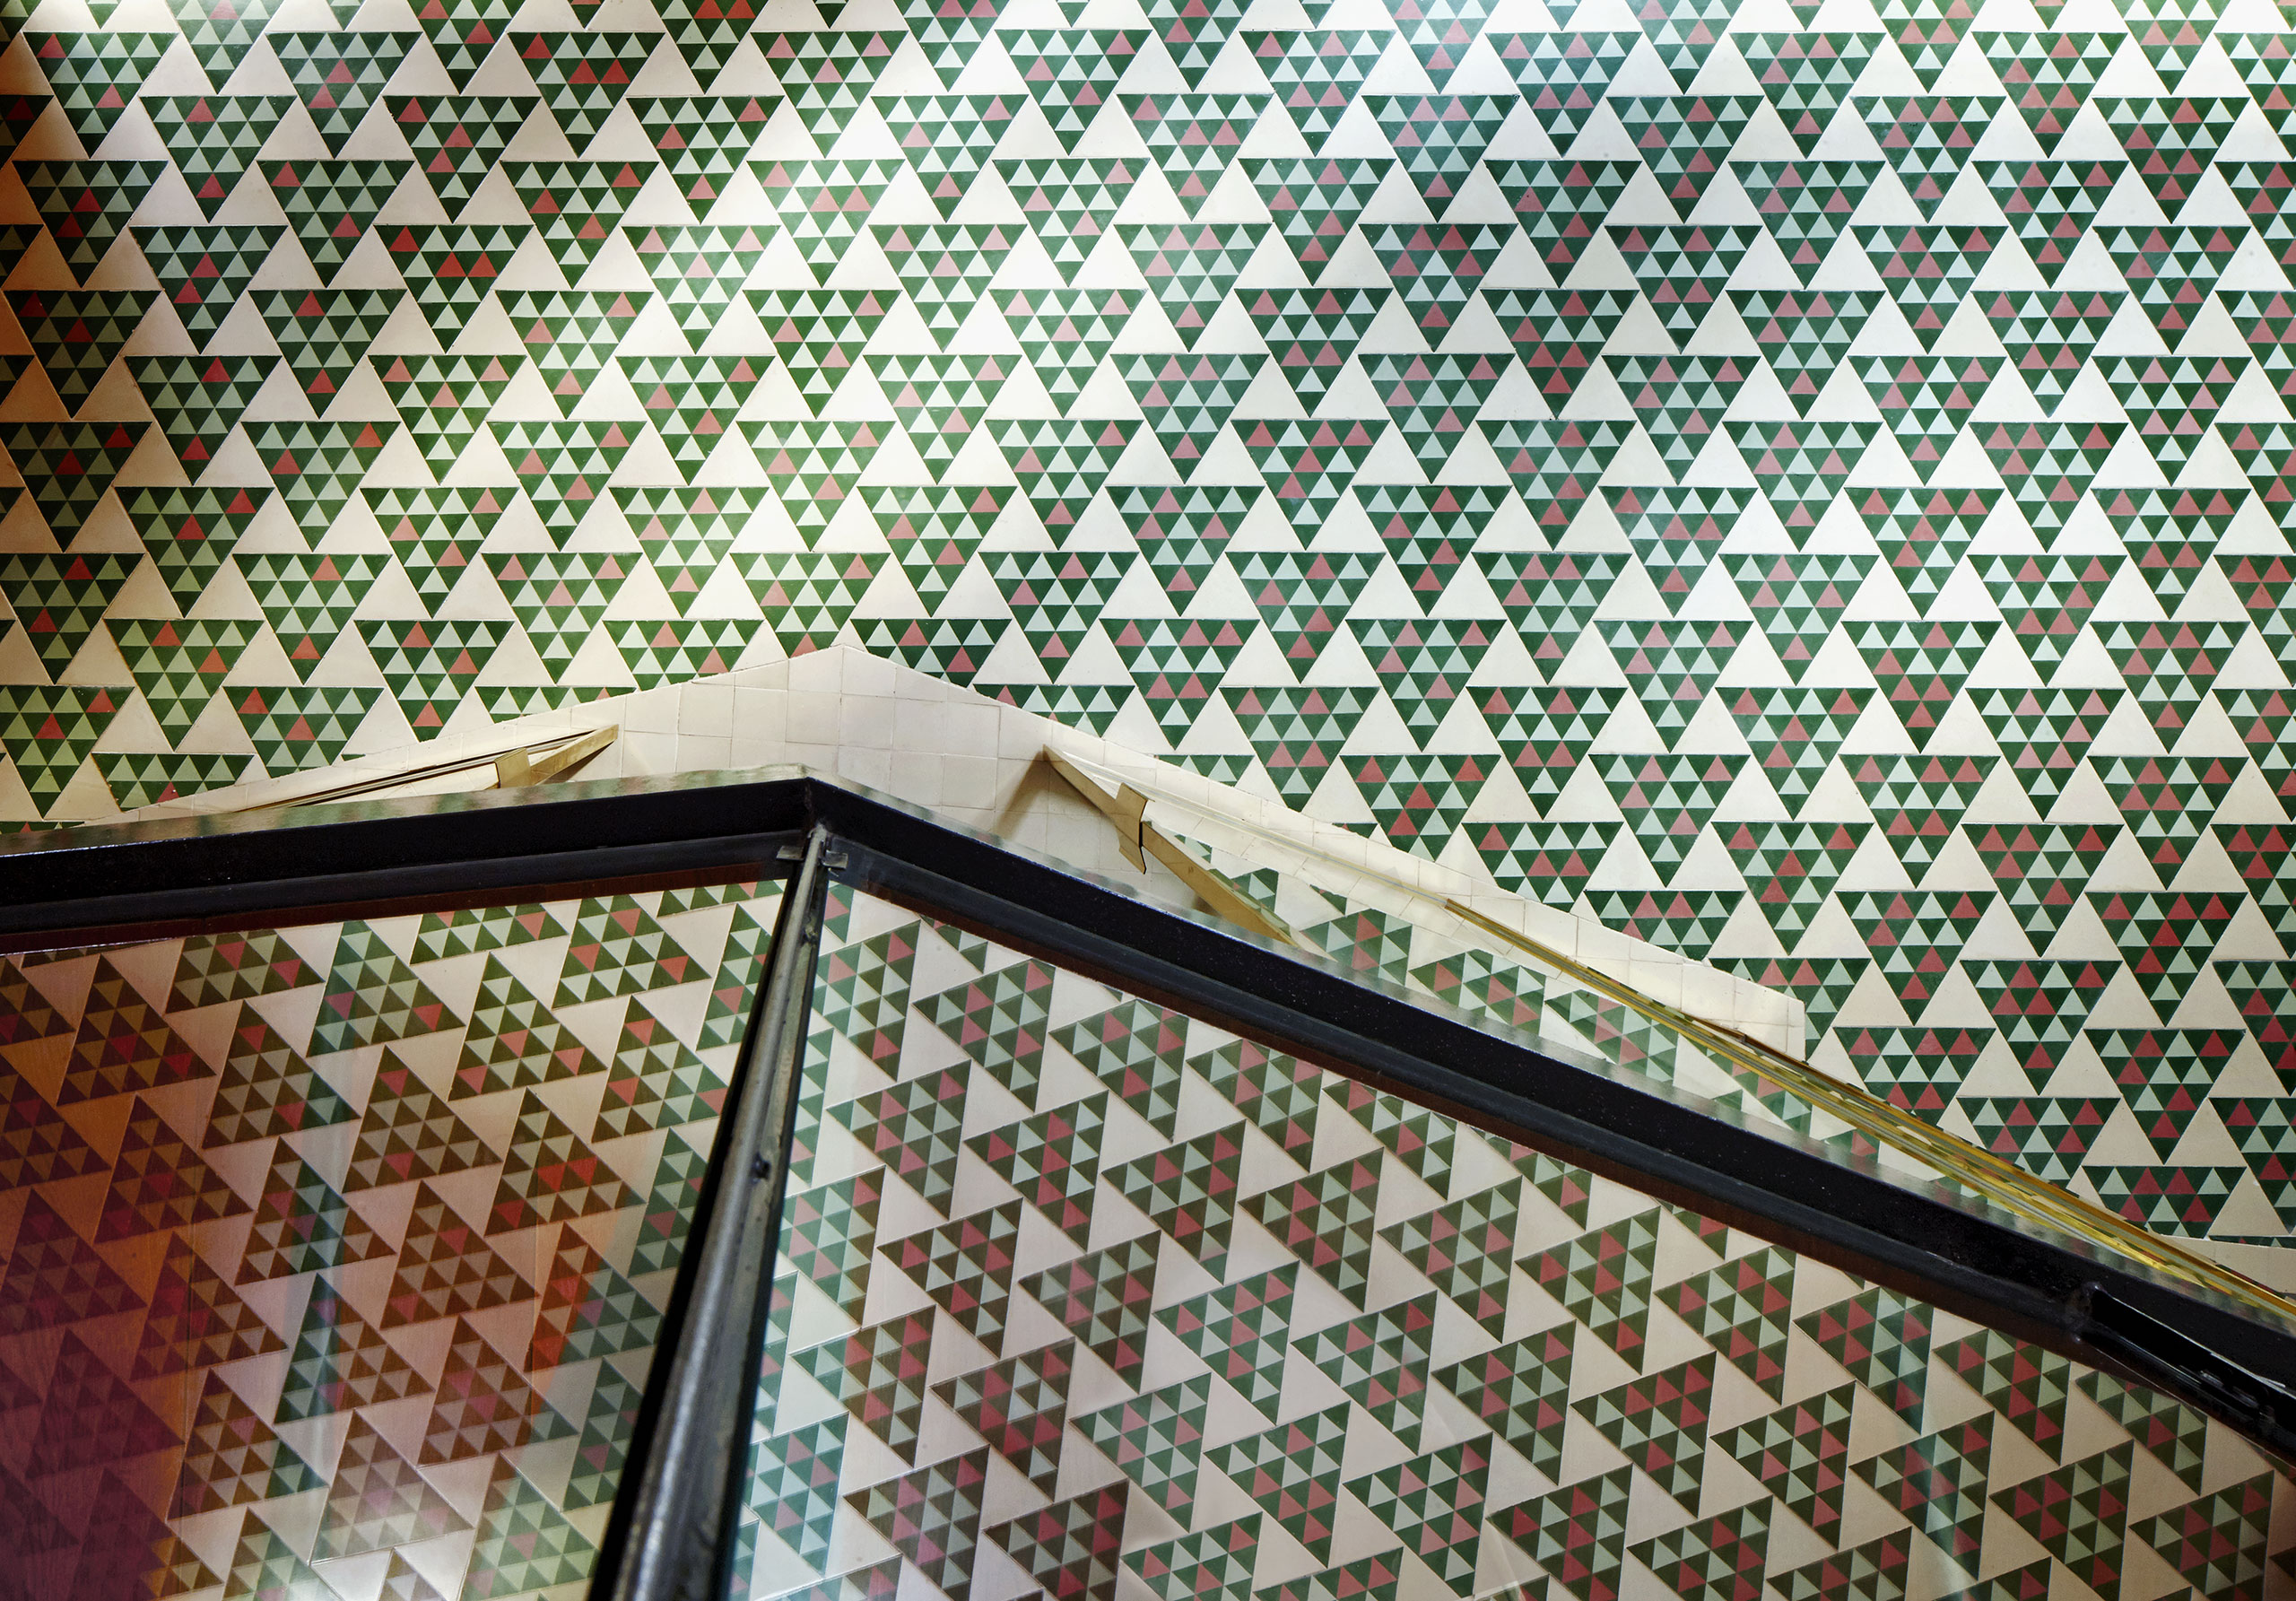 El-Carrer-Avinyó-Apartamento-de-David-Kohn-Architects-en-Barcelona-4